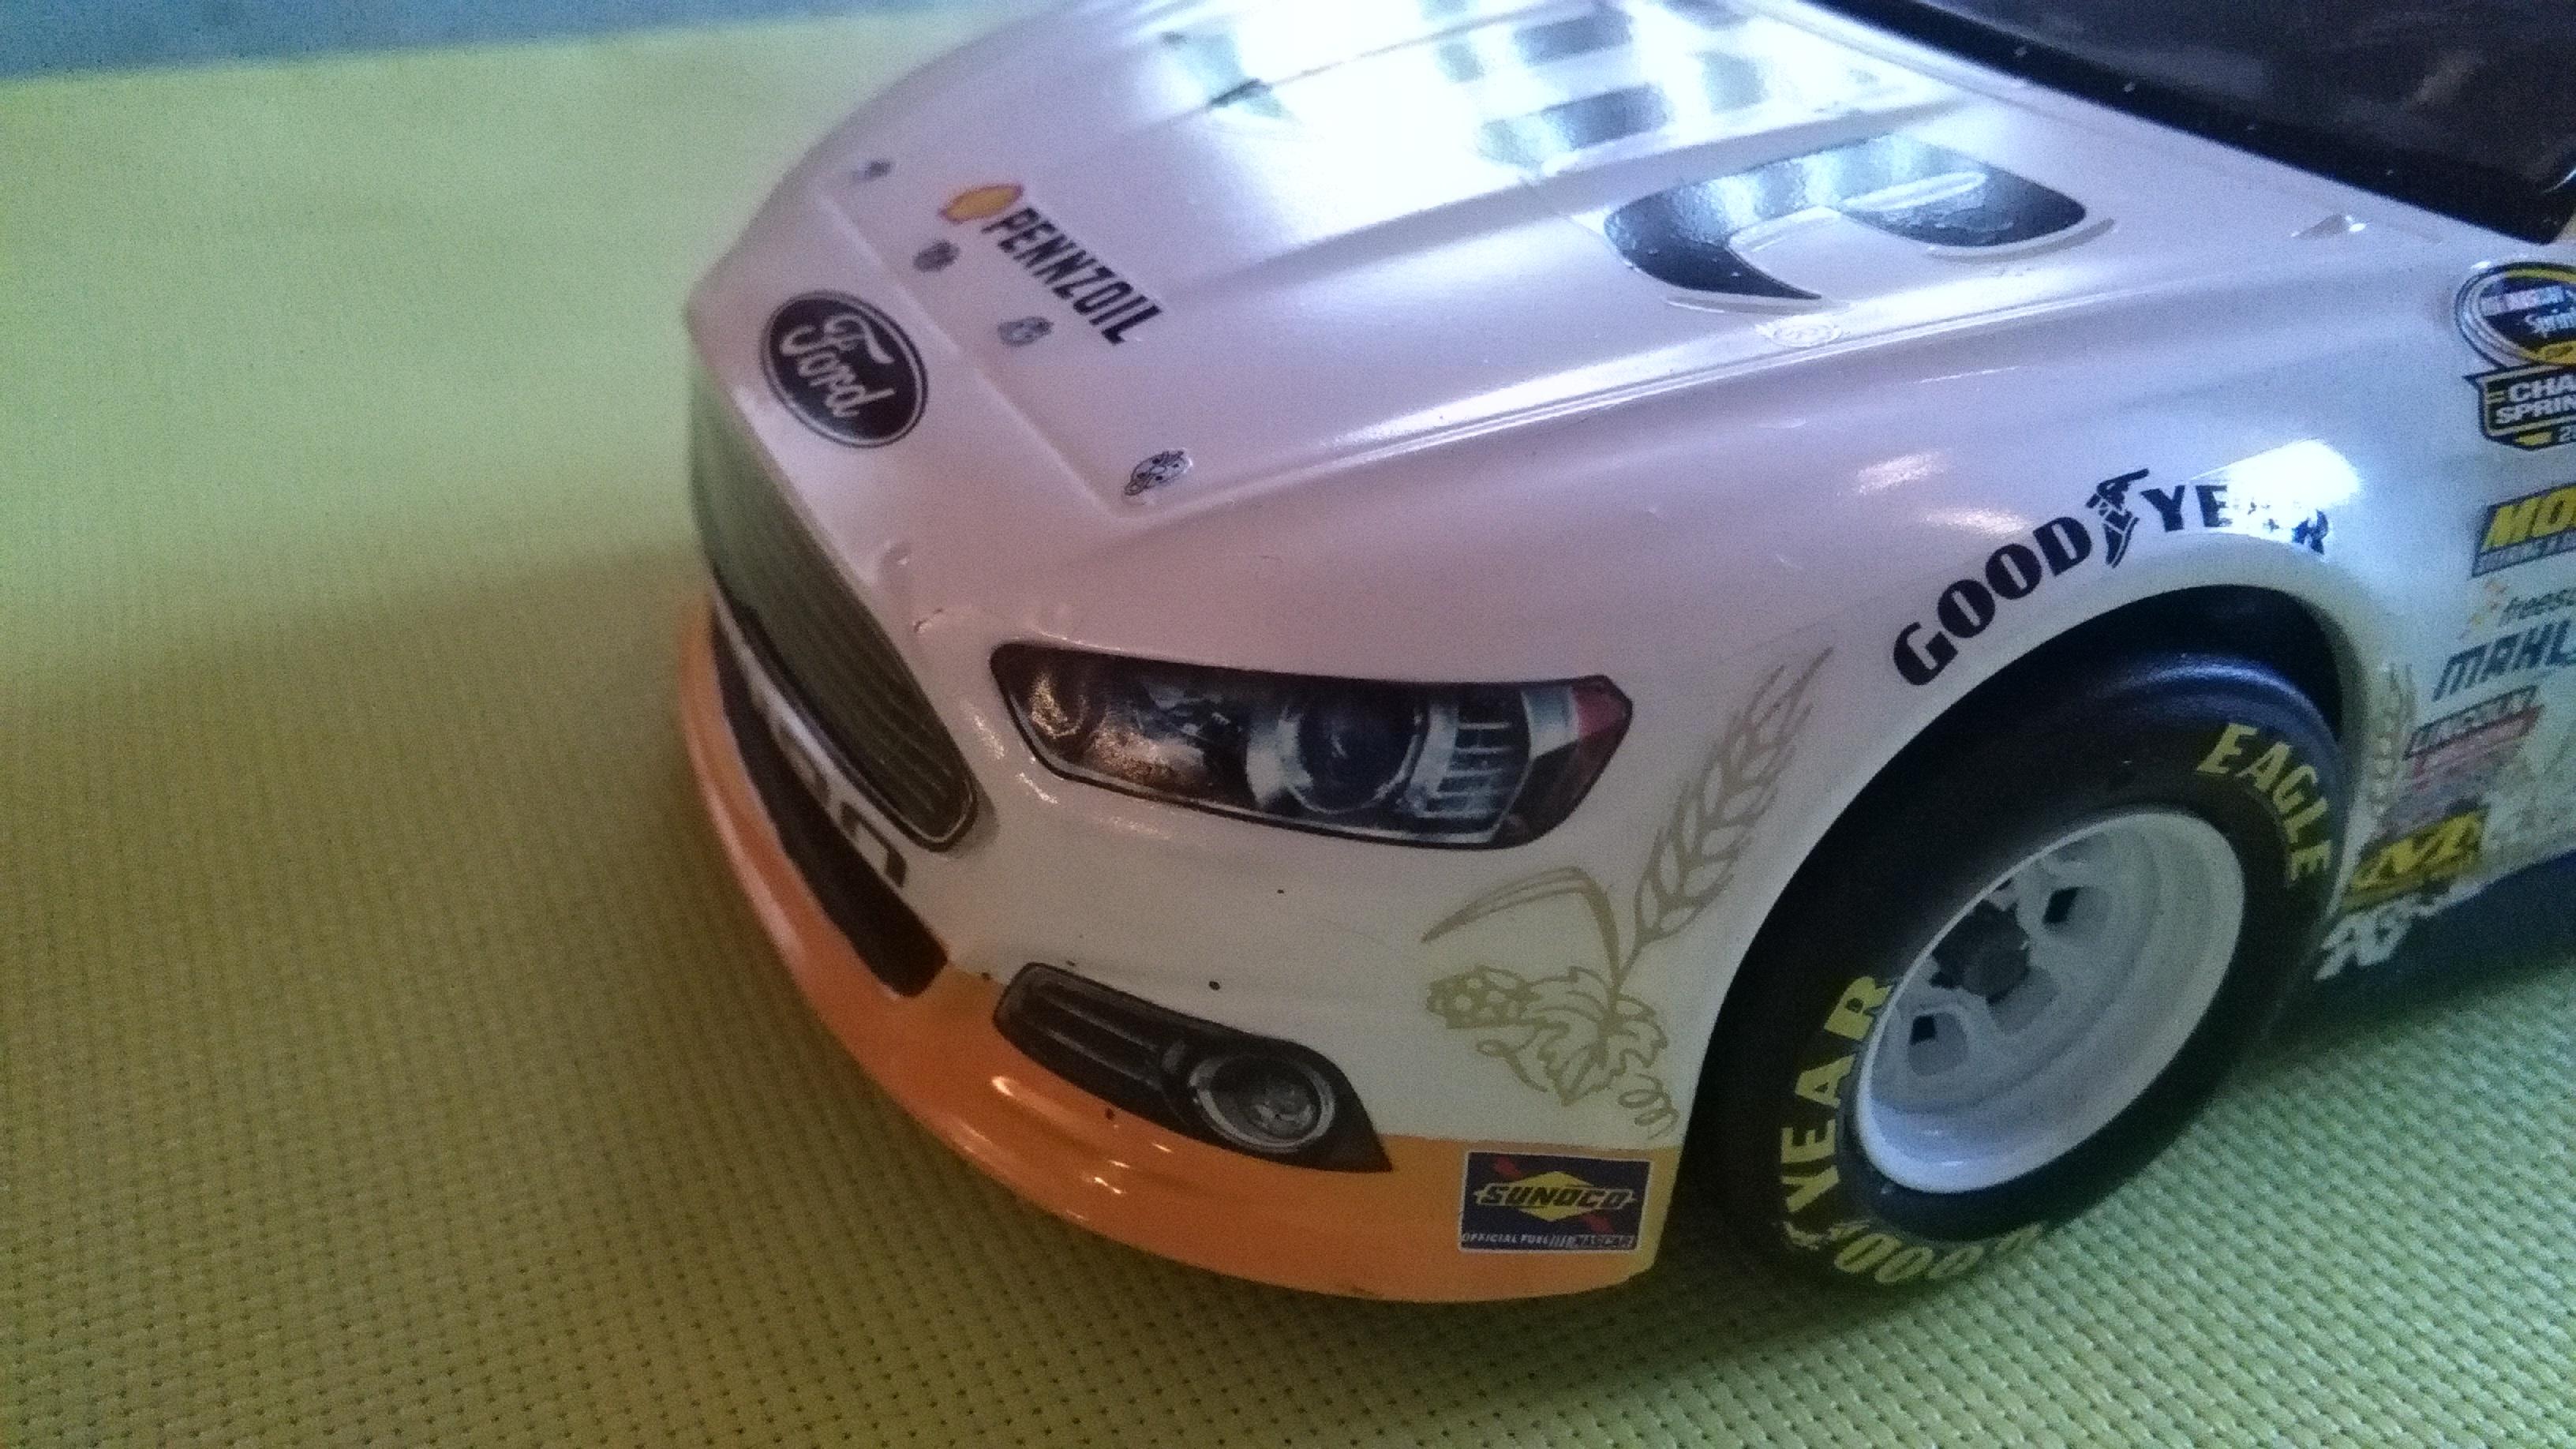 Ford Fusion Penskee 2014 #2 Brad K. Miller Lite - CHASE Version 389158F2013217